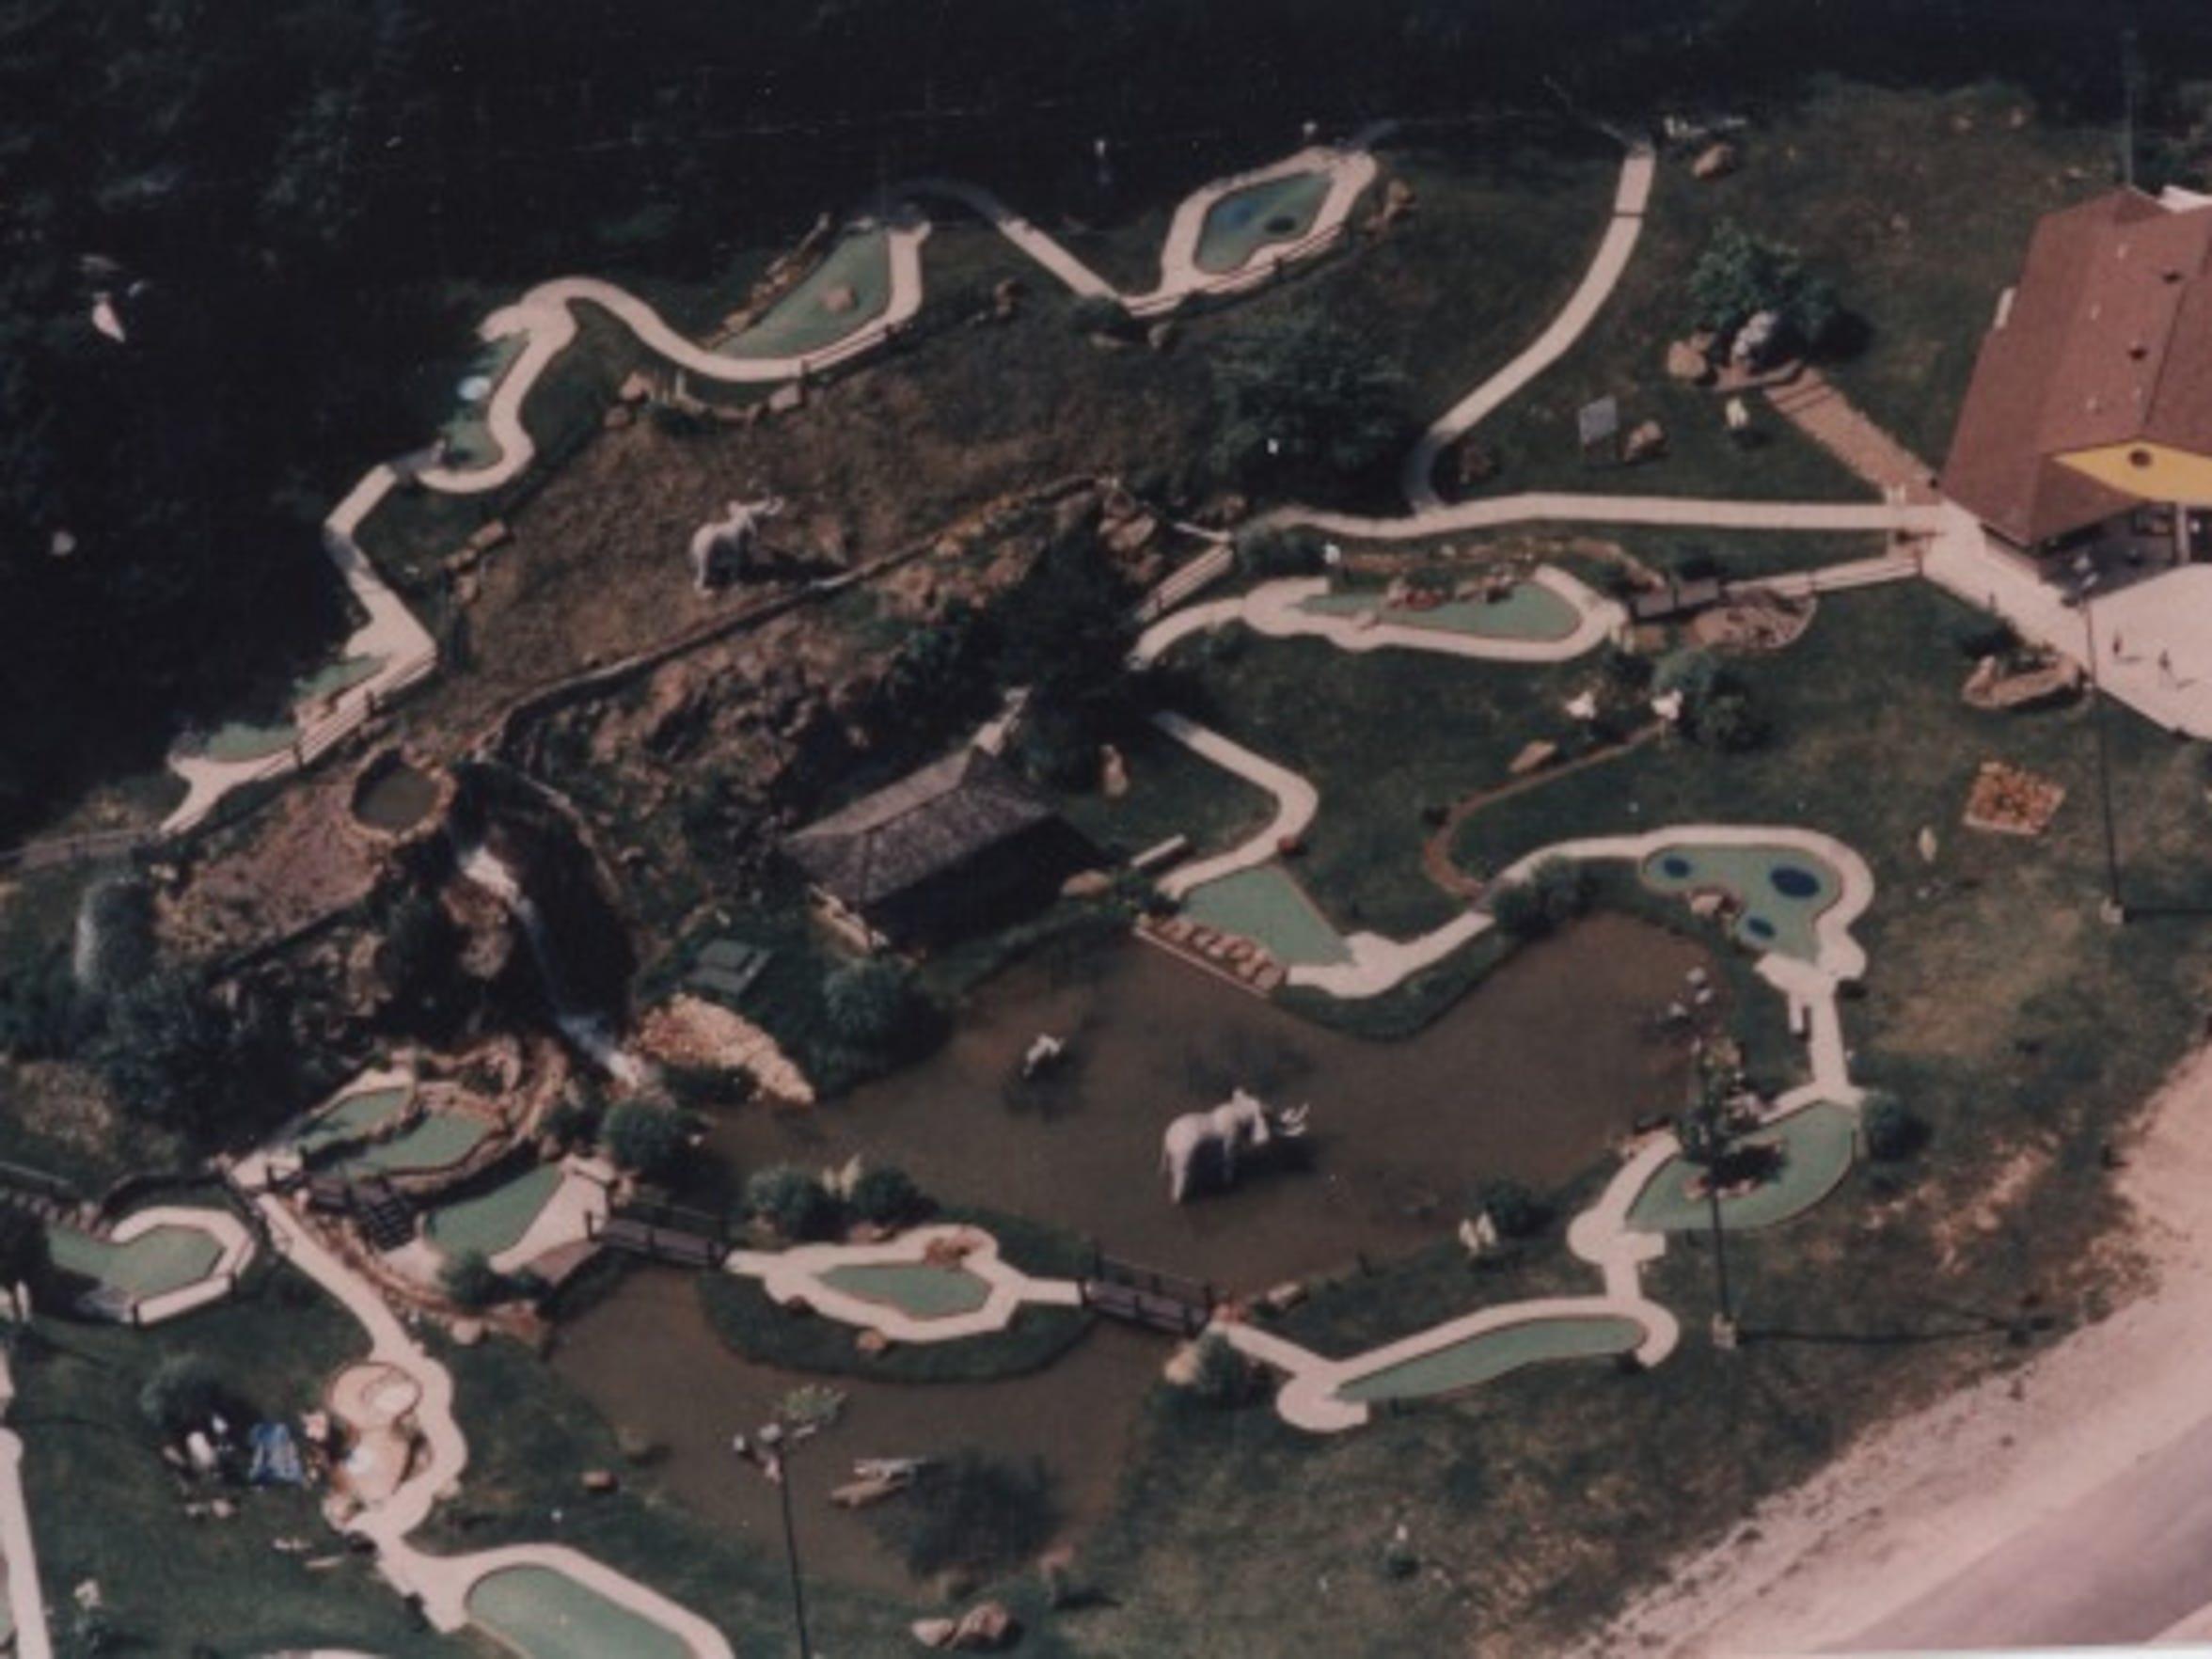 An aerial view of Tropical Gardens Mini Golf before